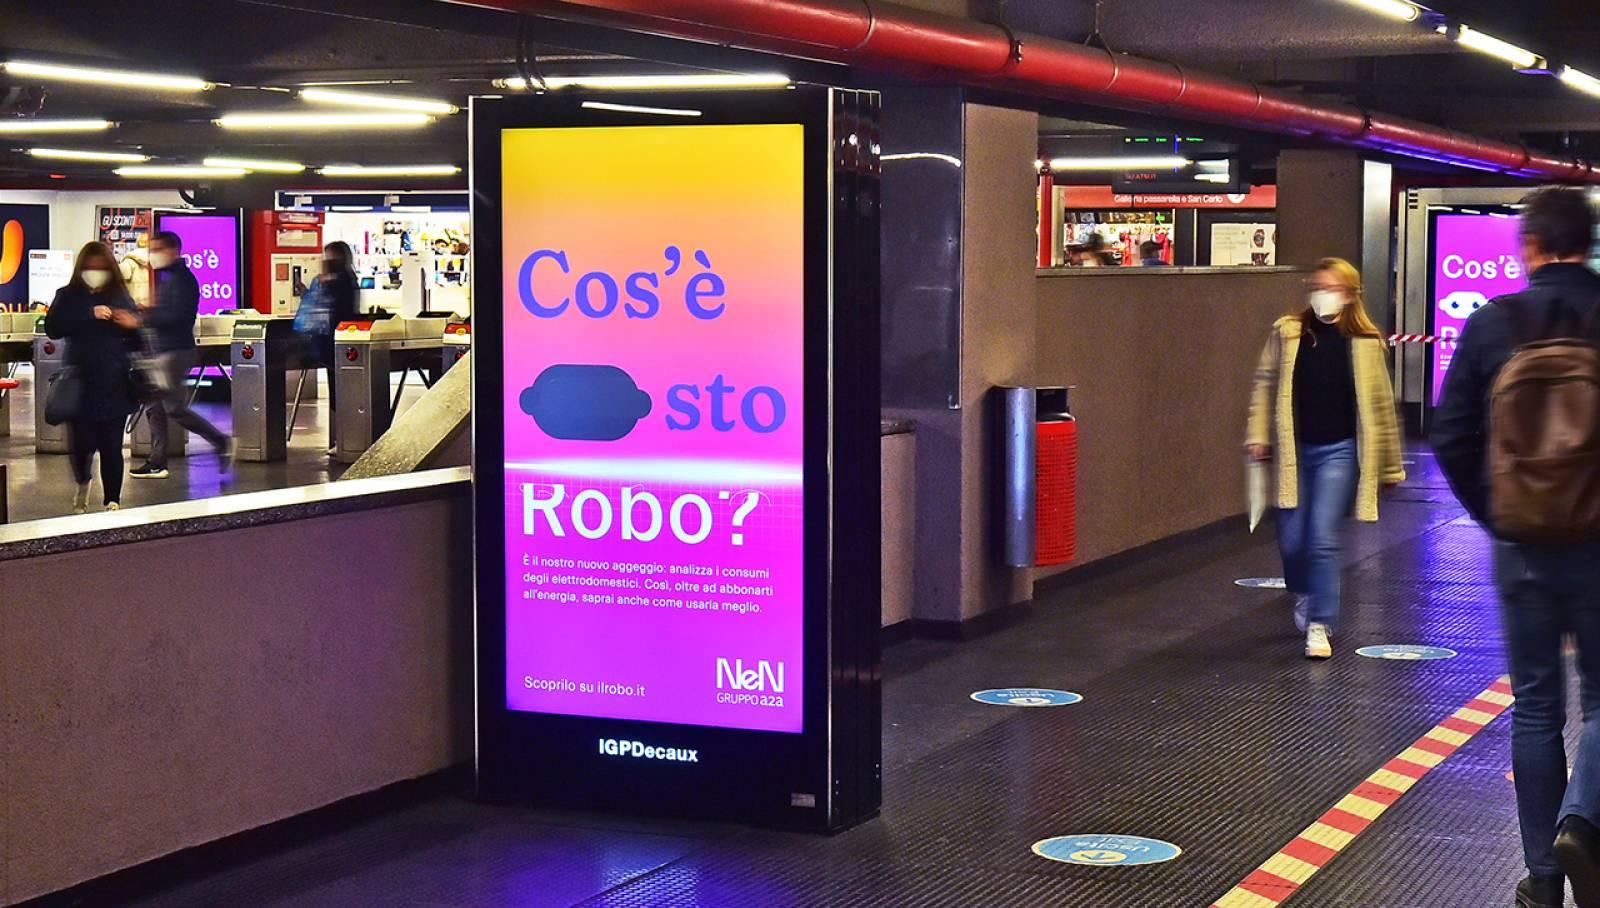 Pubblicità in metropolitana a Milano Network Vision metropolitana IGPDecaux per NeN